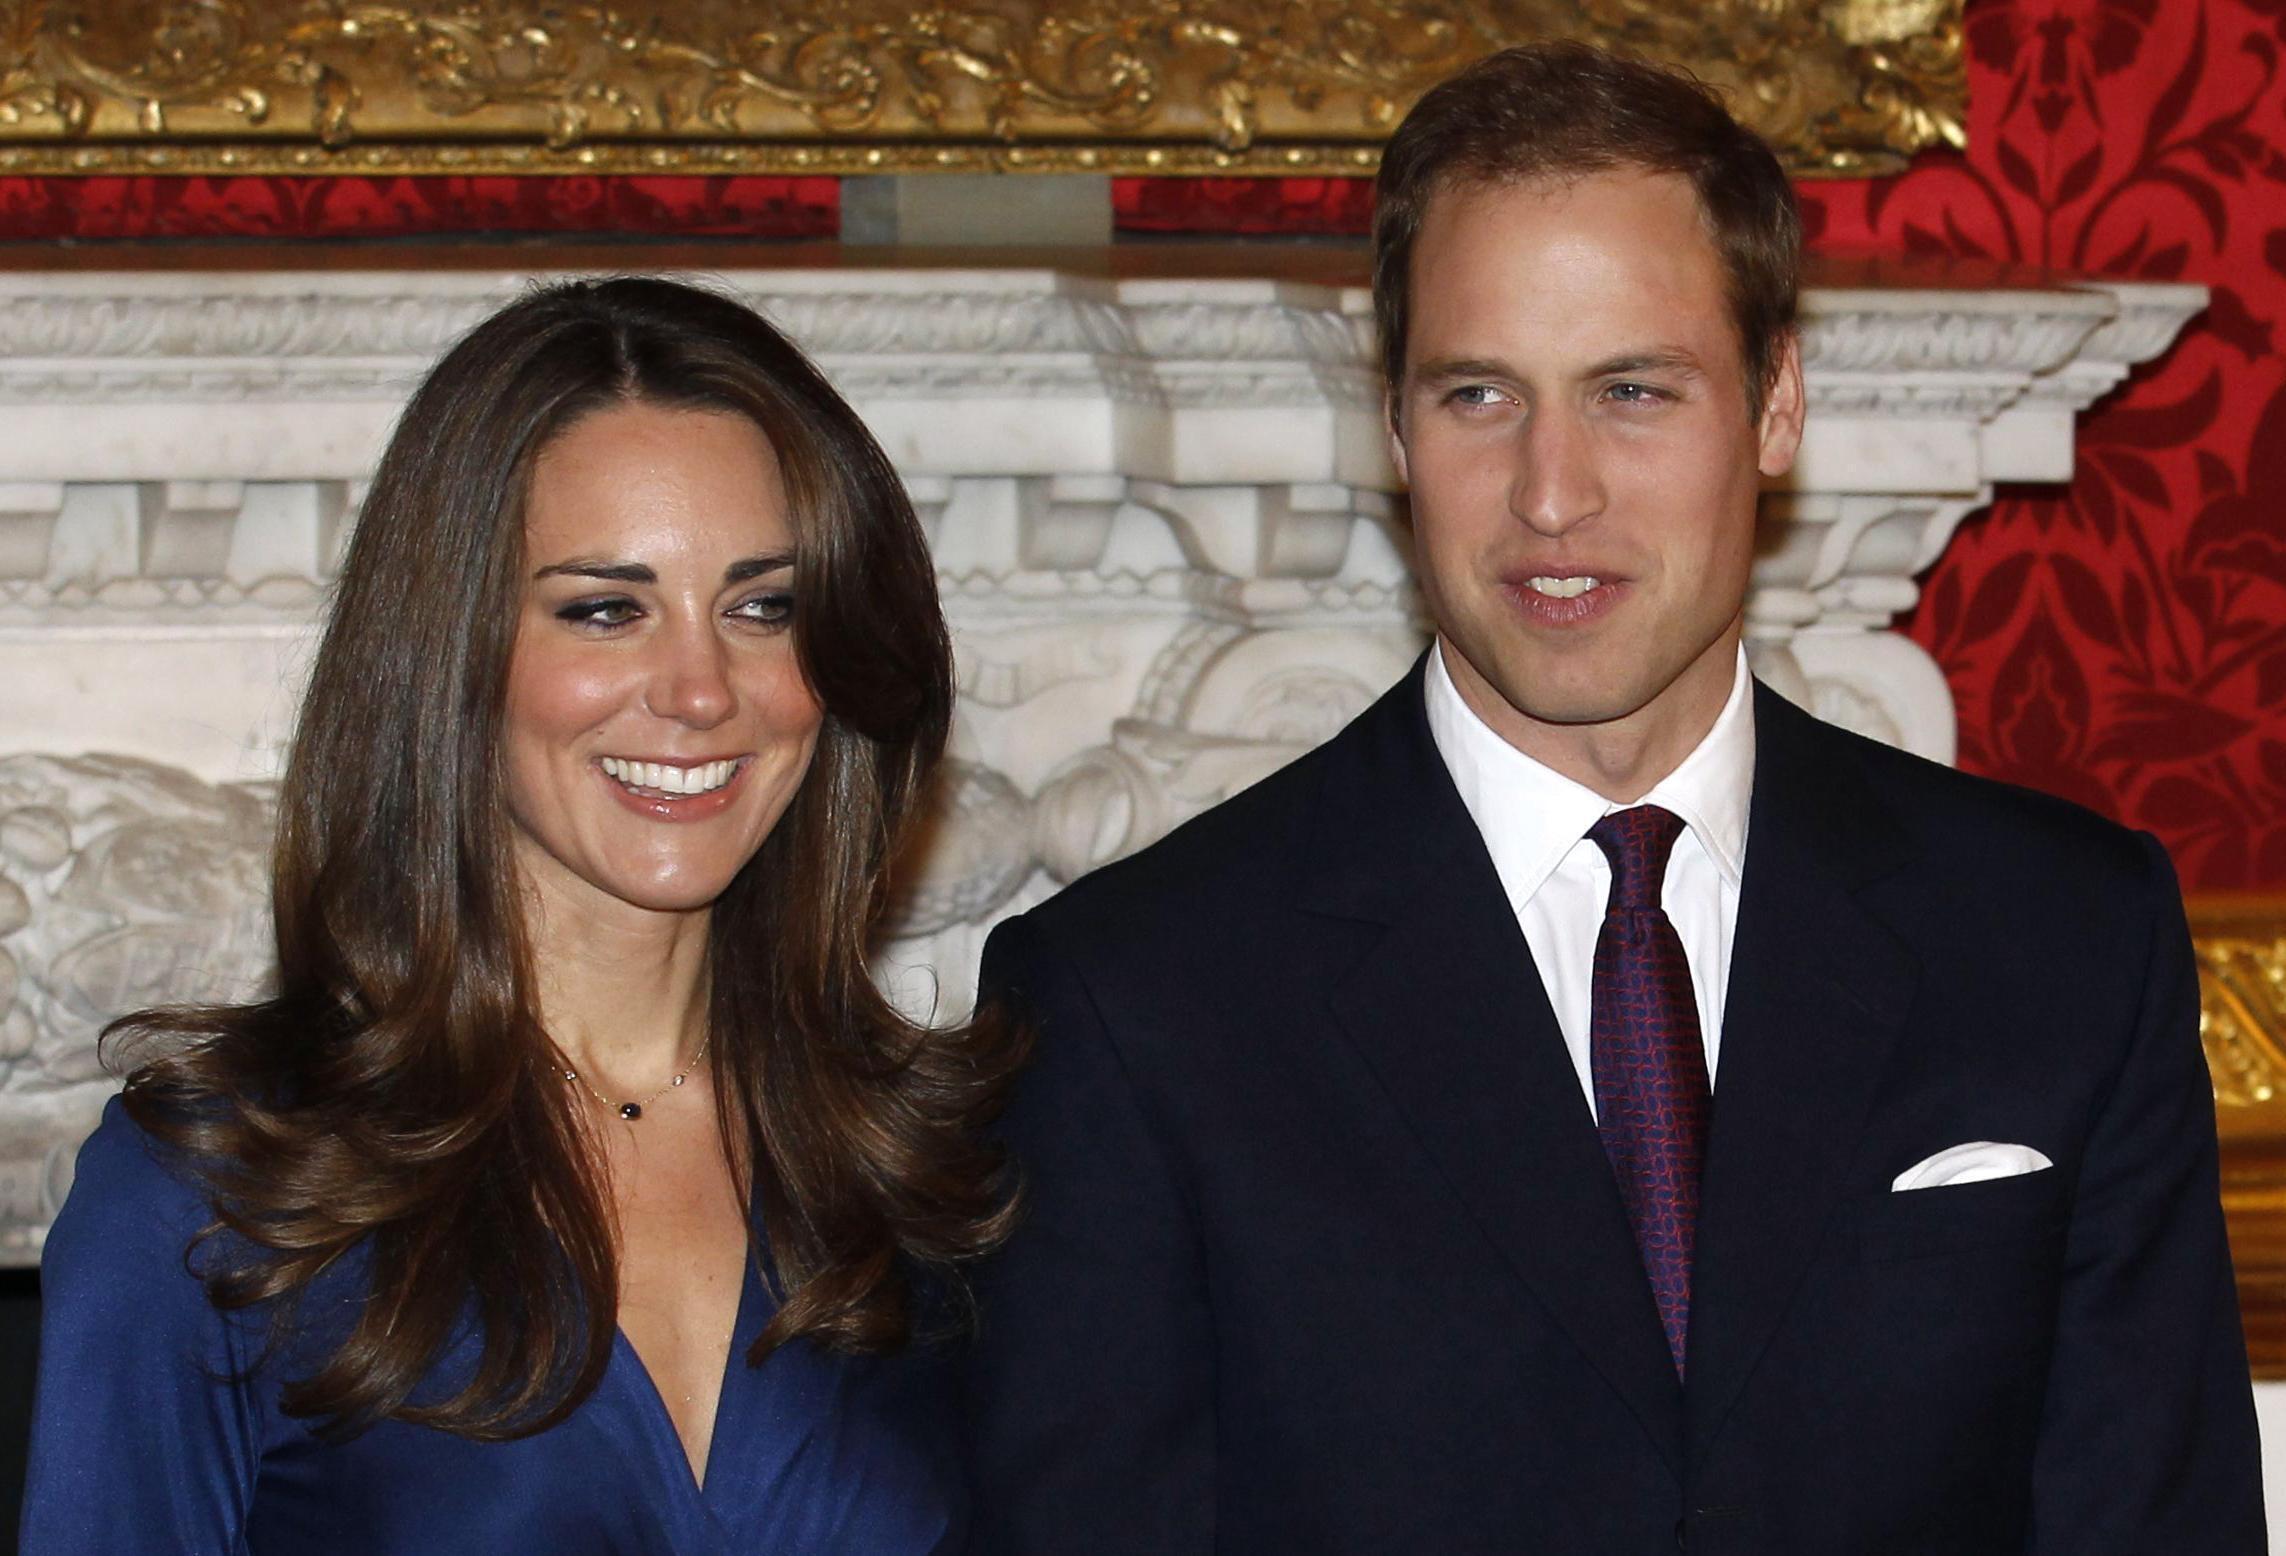 Le prince William et sa future épouse Kate Middleton.